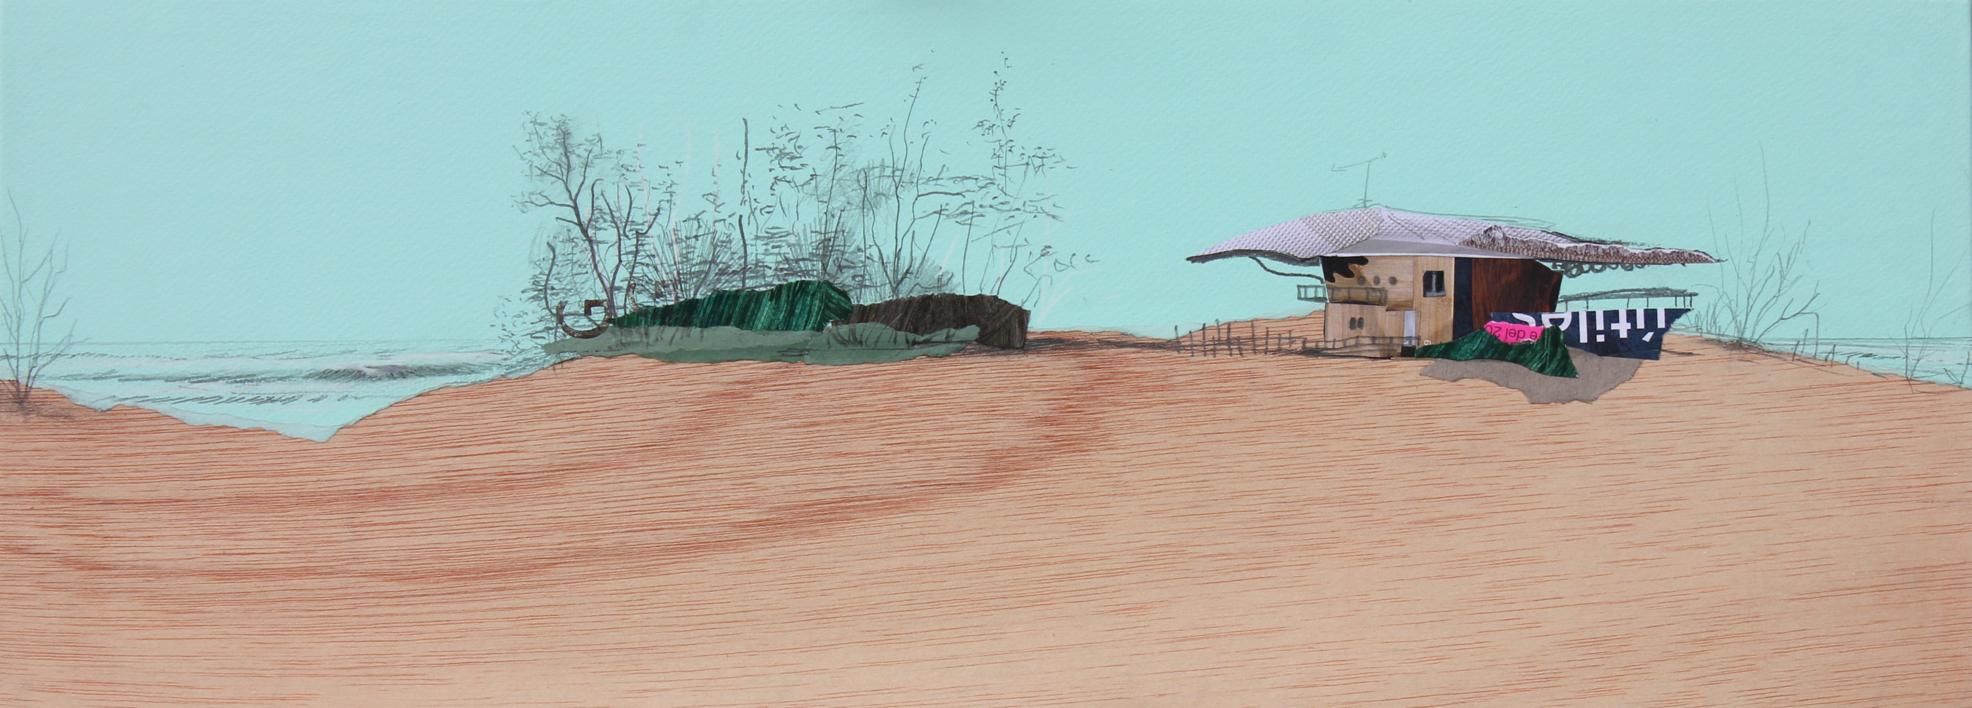 Oasis |Collage de Eduardo Query | Compra arte en Flecha.es